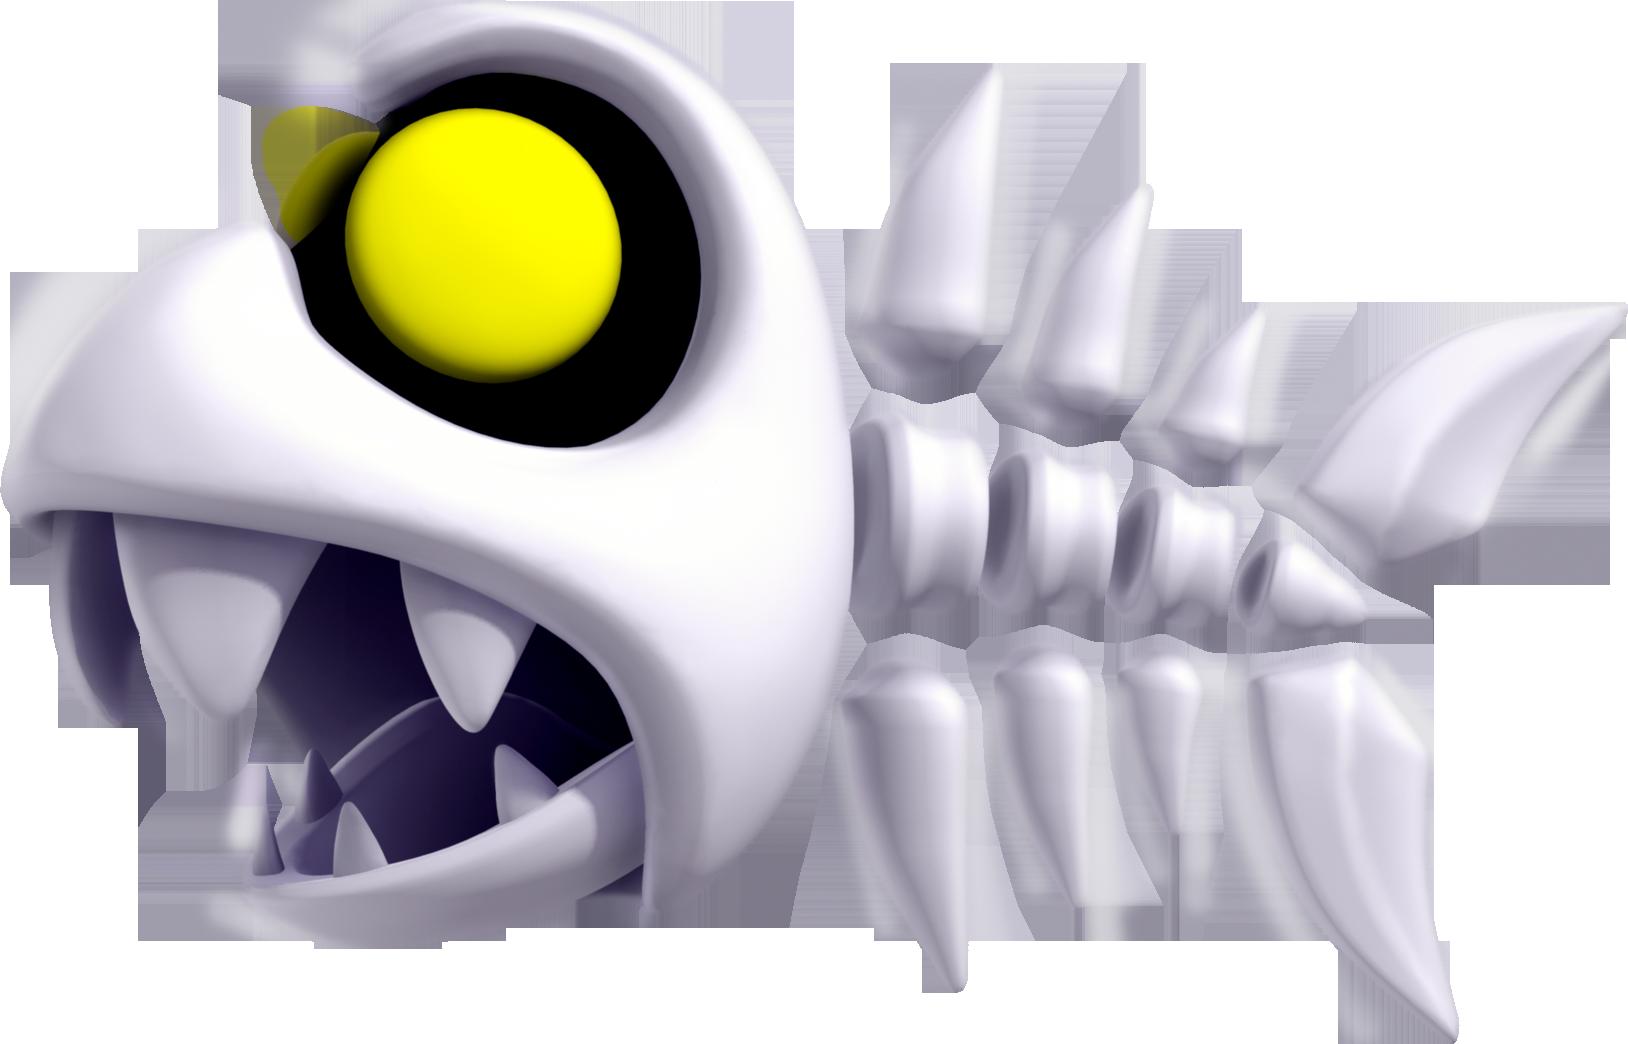 Clipart fish skeleton svg freeuse library Fish Bone | Fantendo - Nintendo Fanon Wiki | FANDOM powered by Wikia svg freeuse library